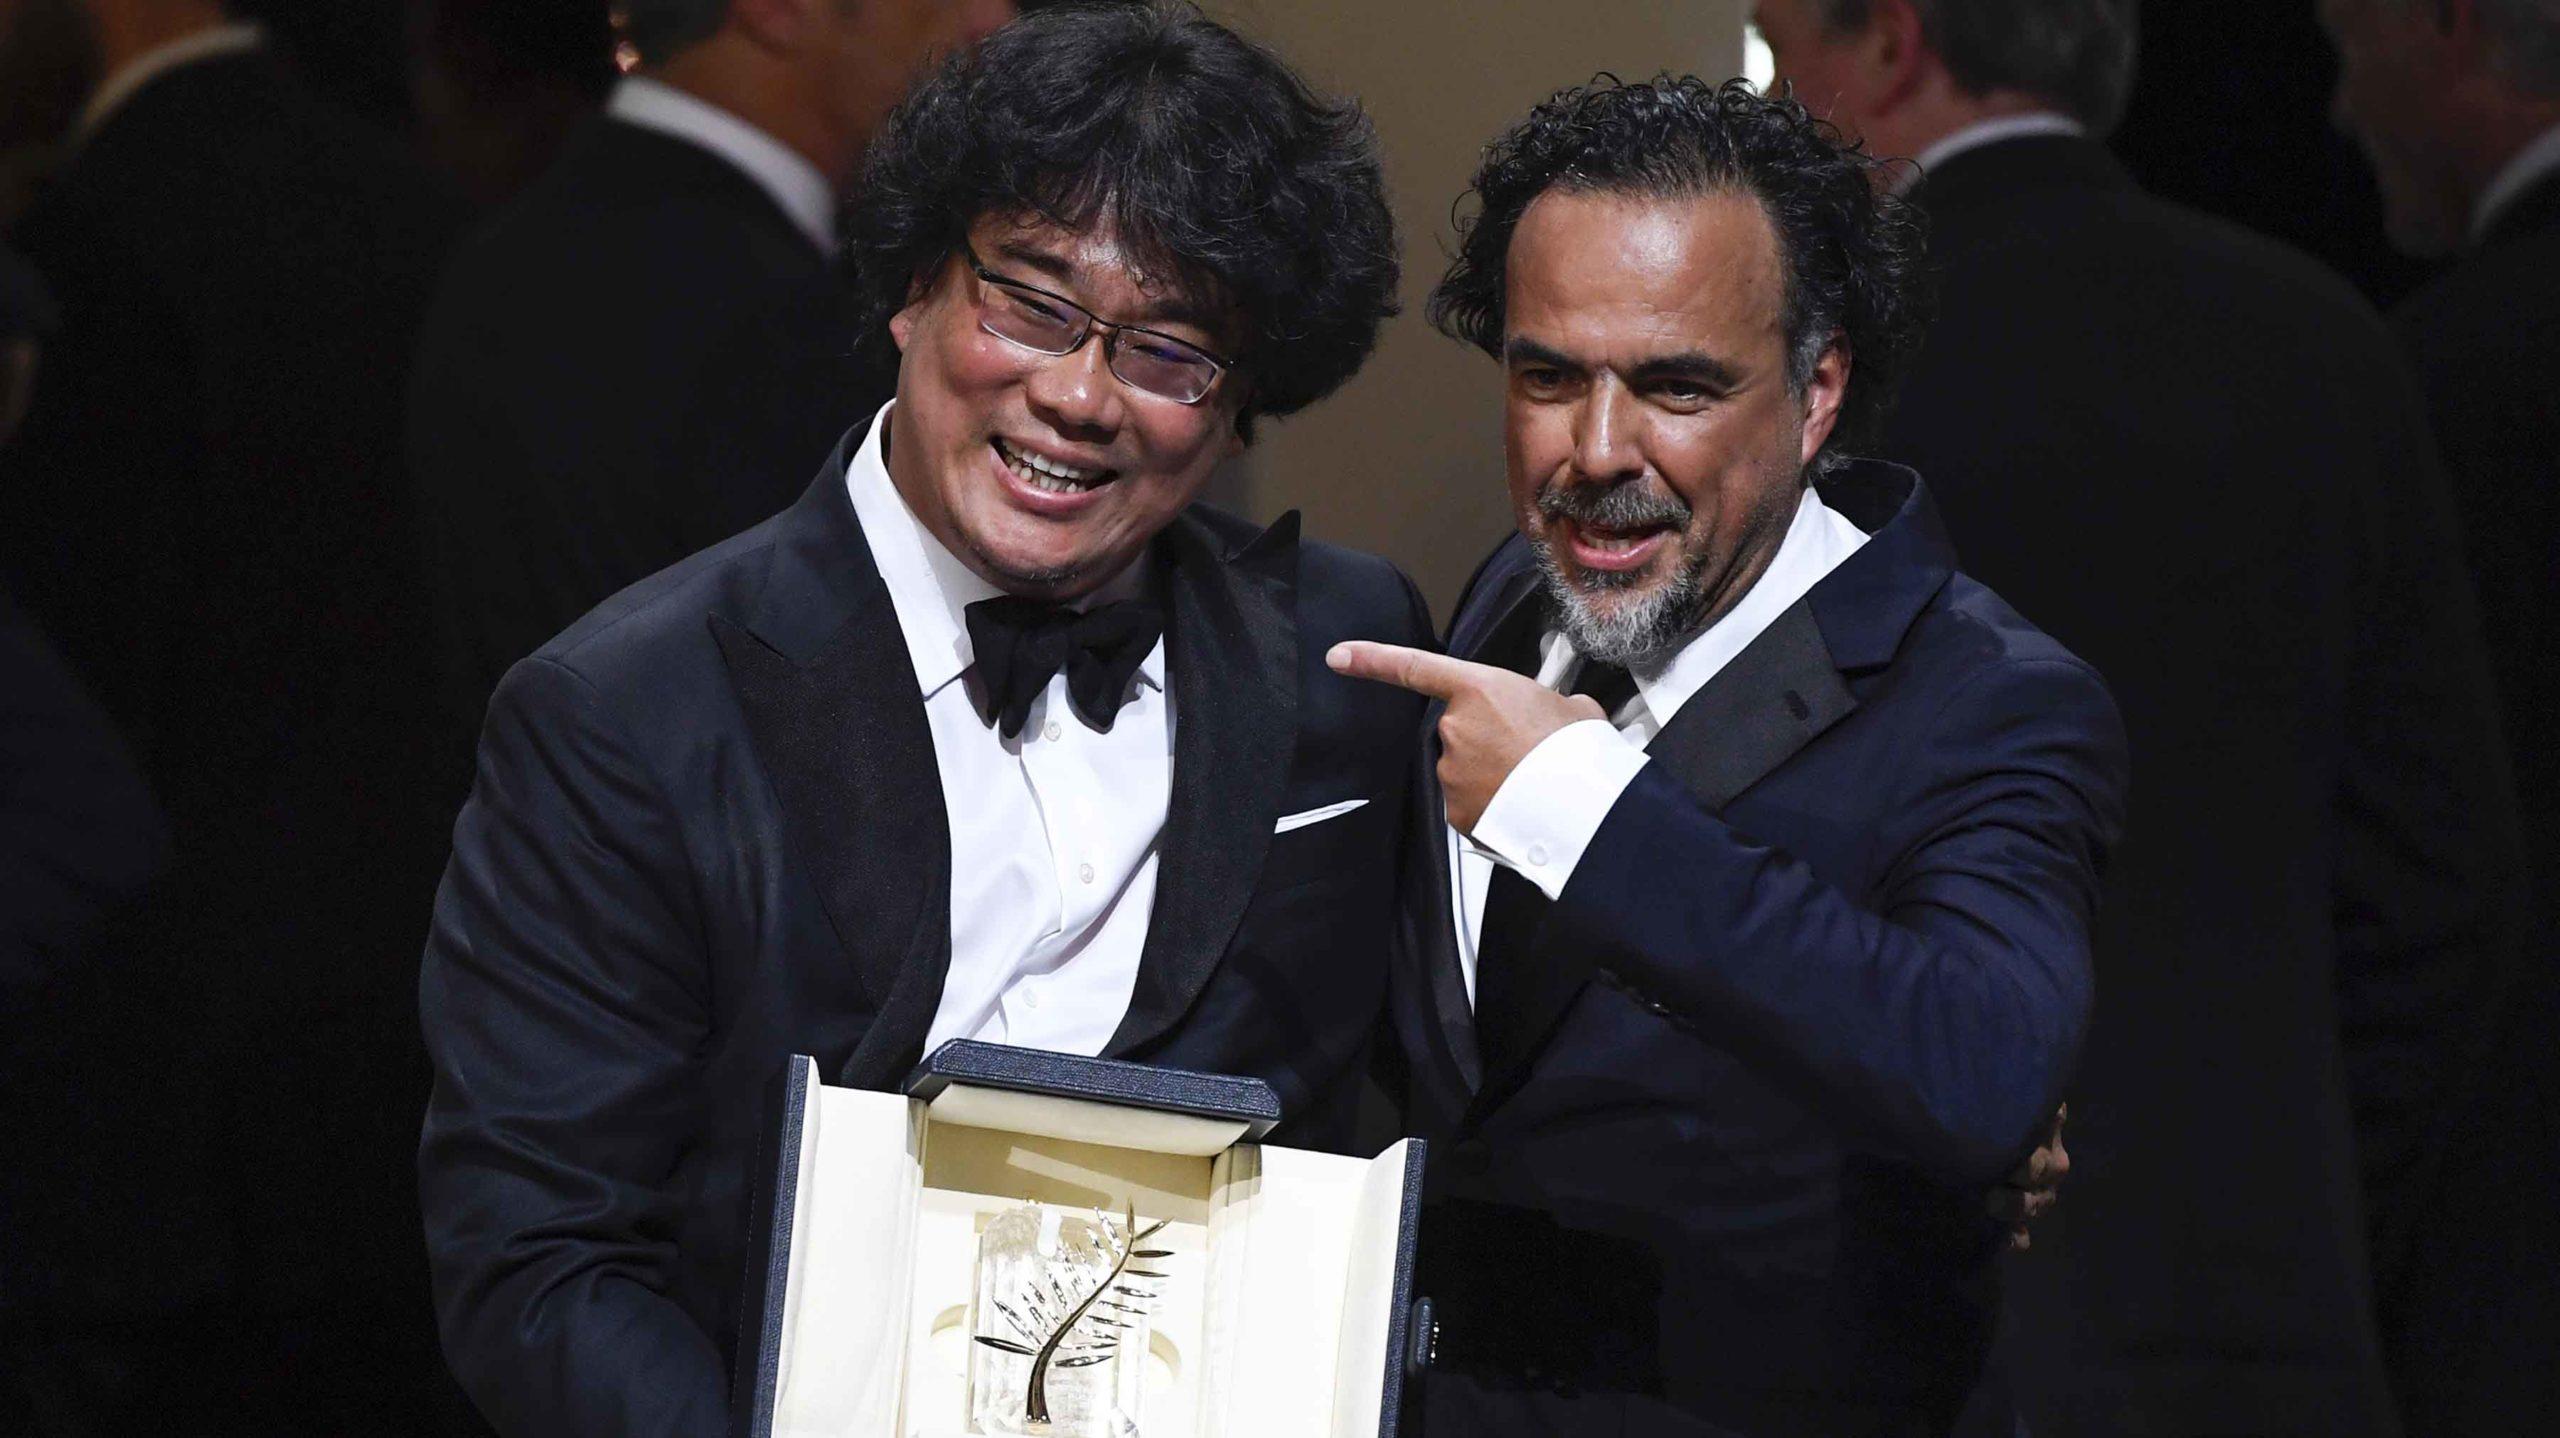 Cannes 2019: Parasite de Bong Joon-ho gana la Palme d'Or 2019